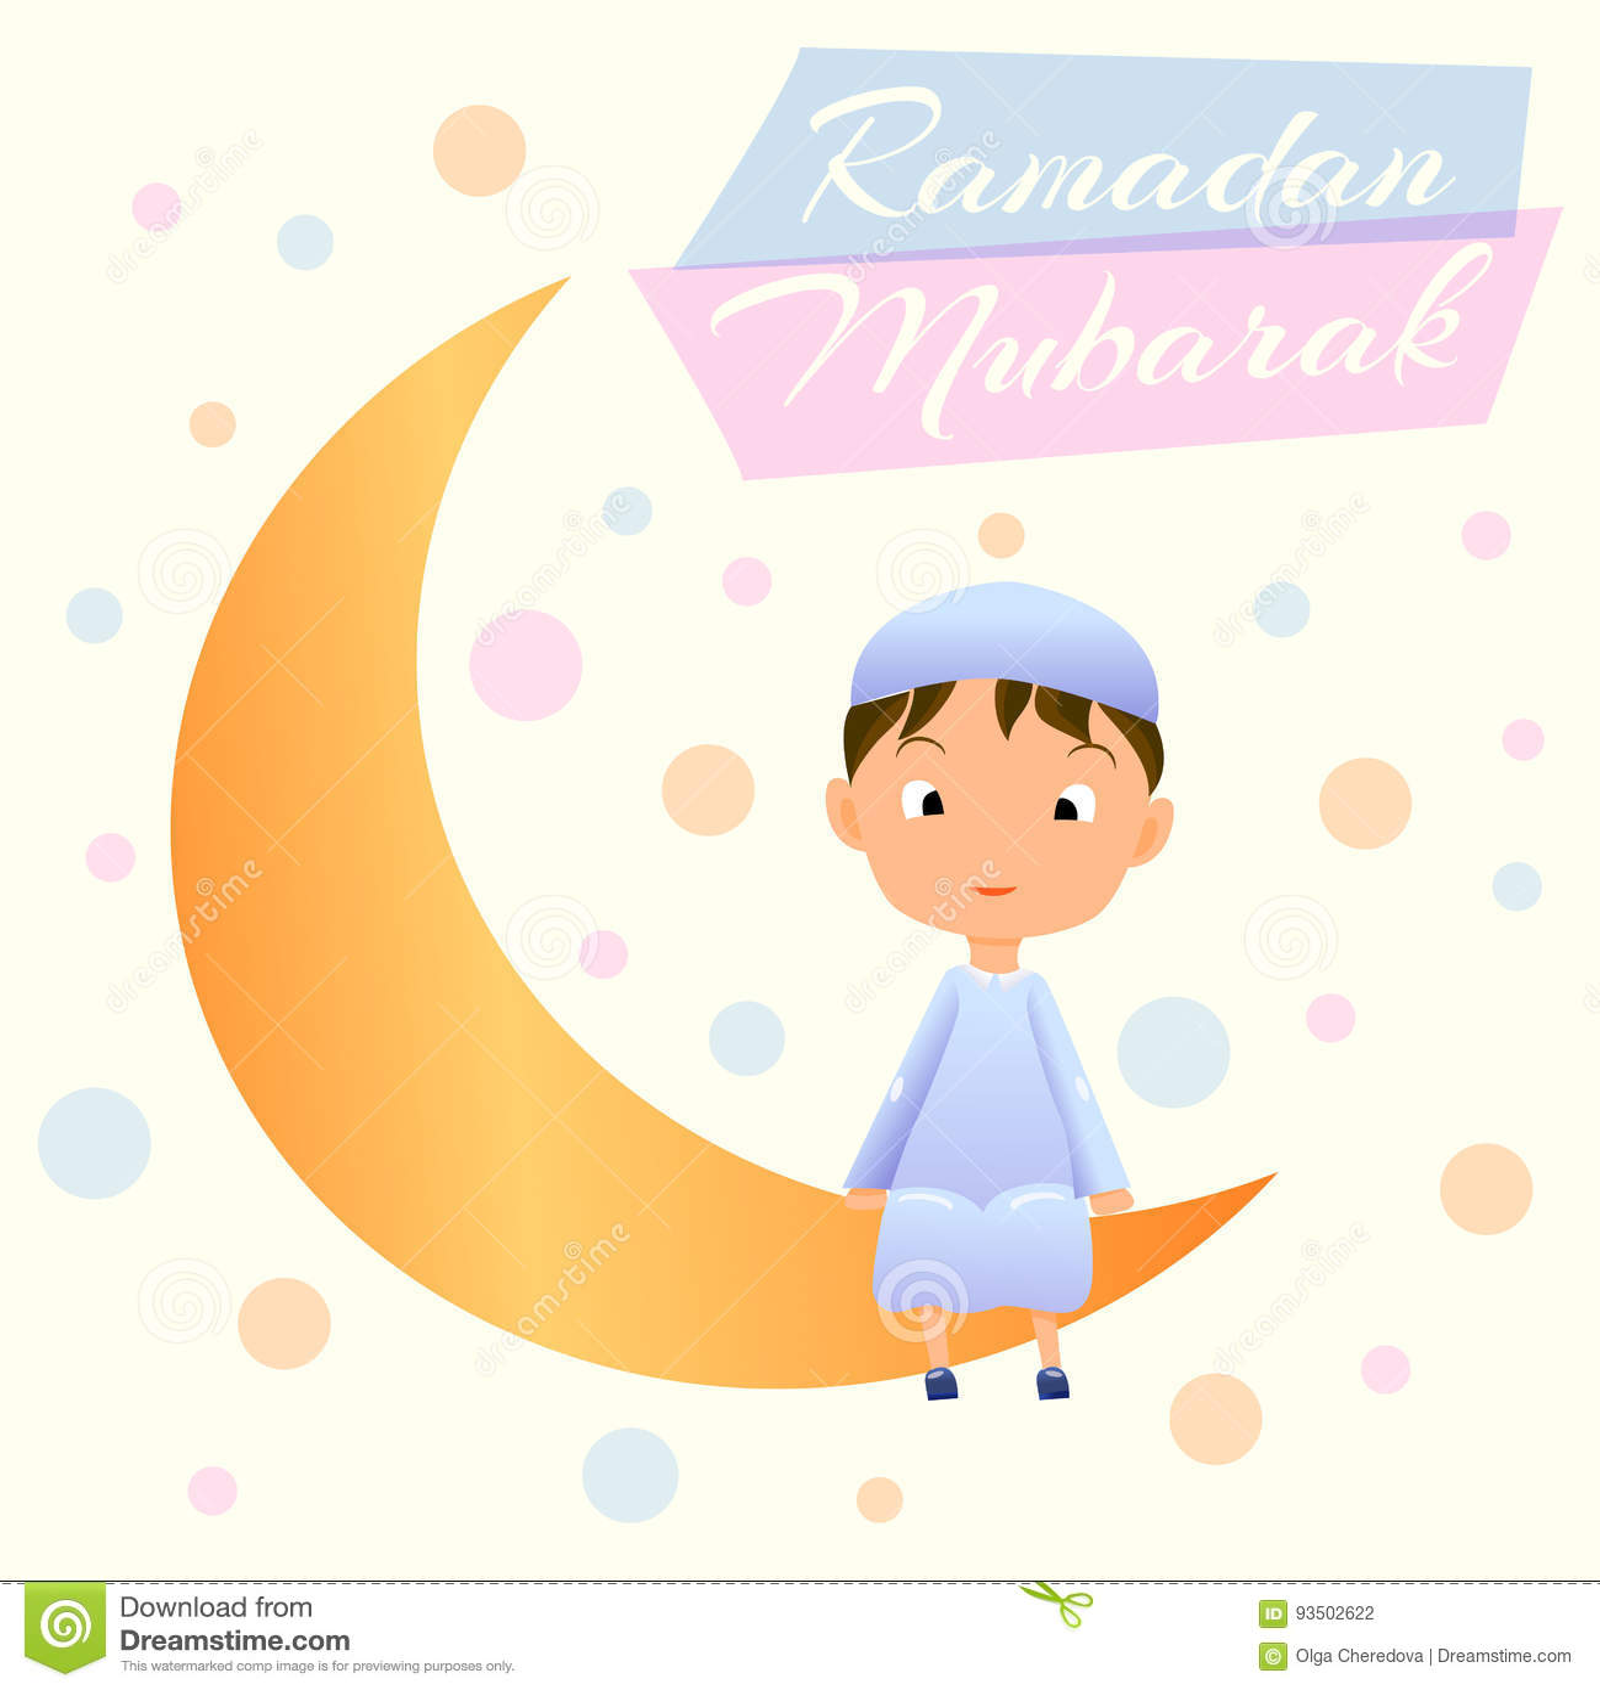 Arabic muslim boy stock vector illustration of religious 93502622 download arabic muslim boy stock vector illustration of religious 93502622 m4hsunfo